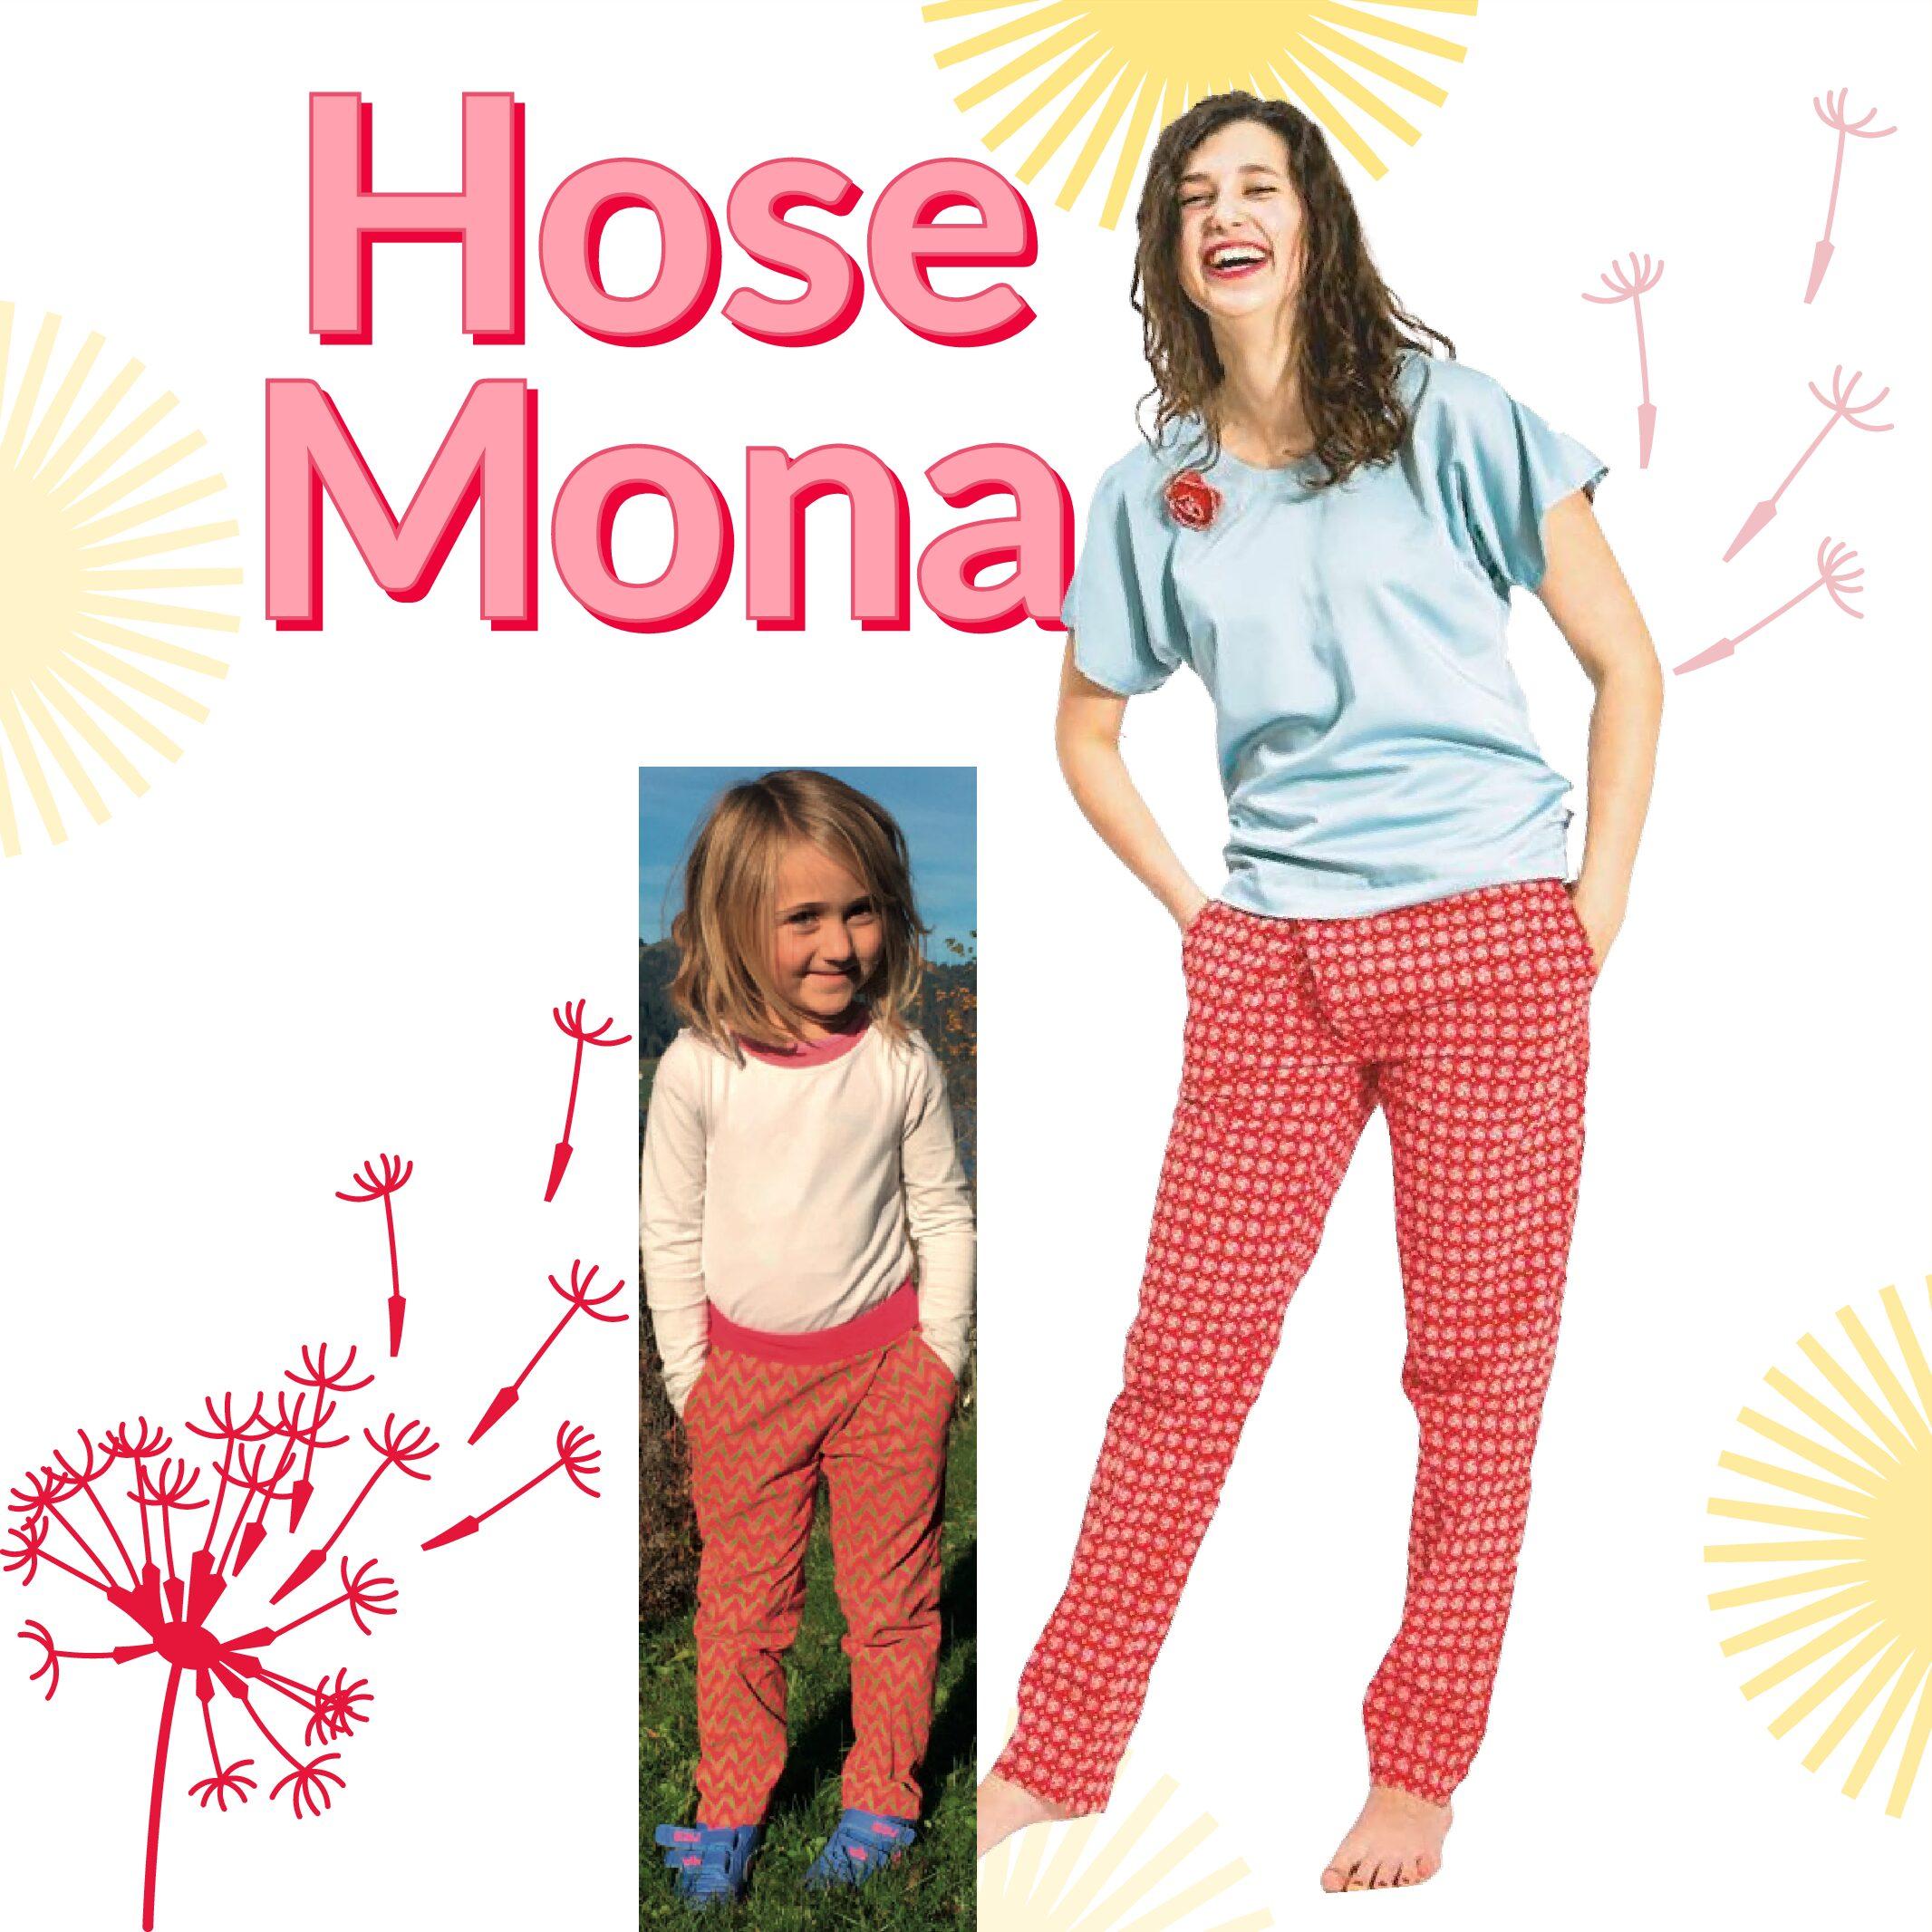 Kombination: Hose Mona & Hose Mona mini / Papierschnitt